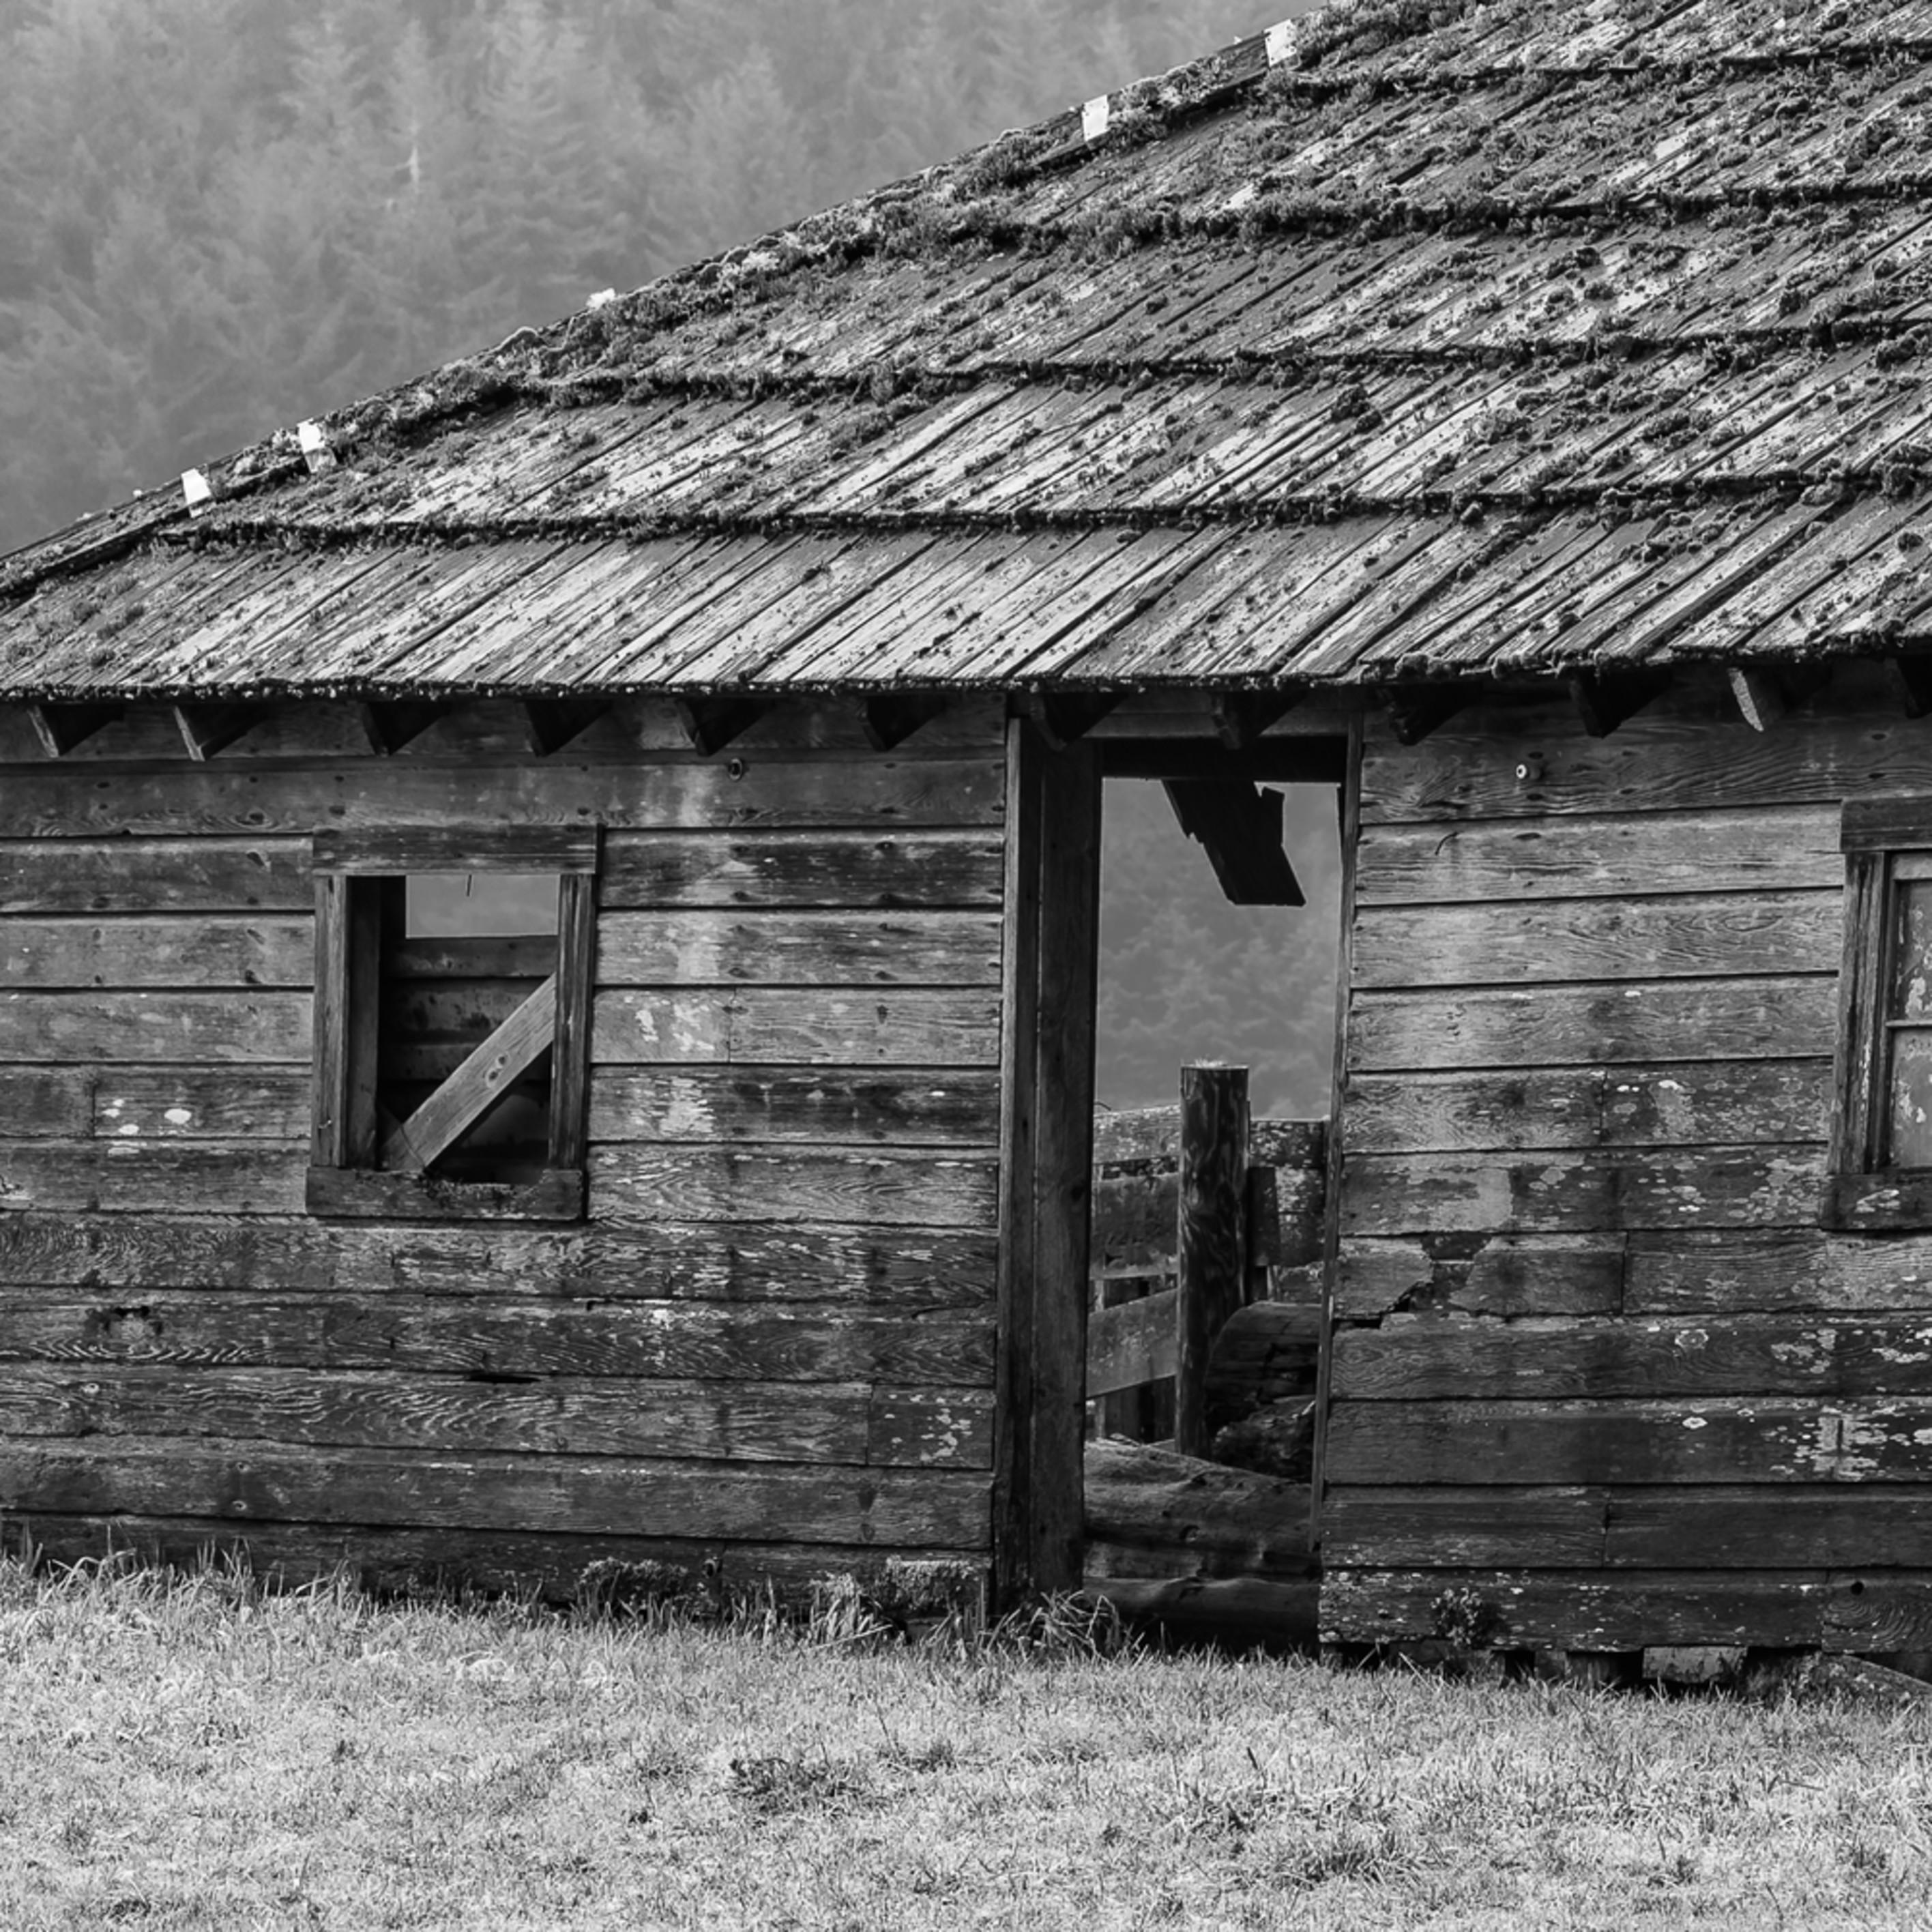 Old barn cowan heritage ranch washington 2016 uphm0m